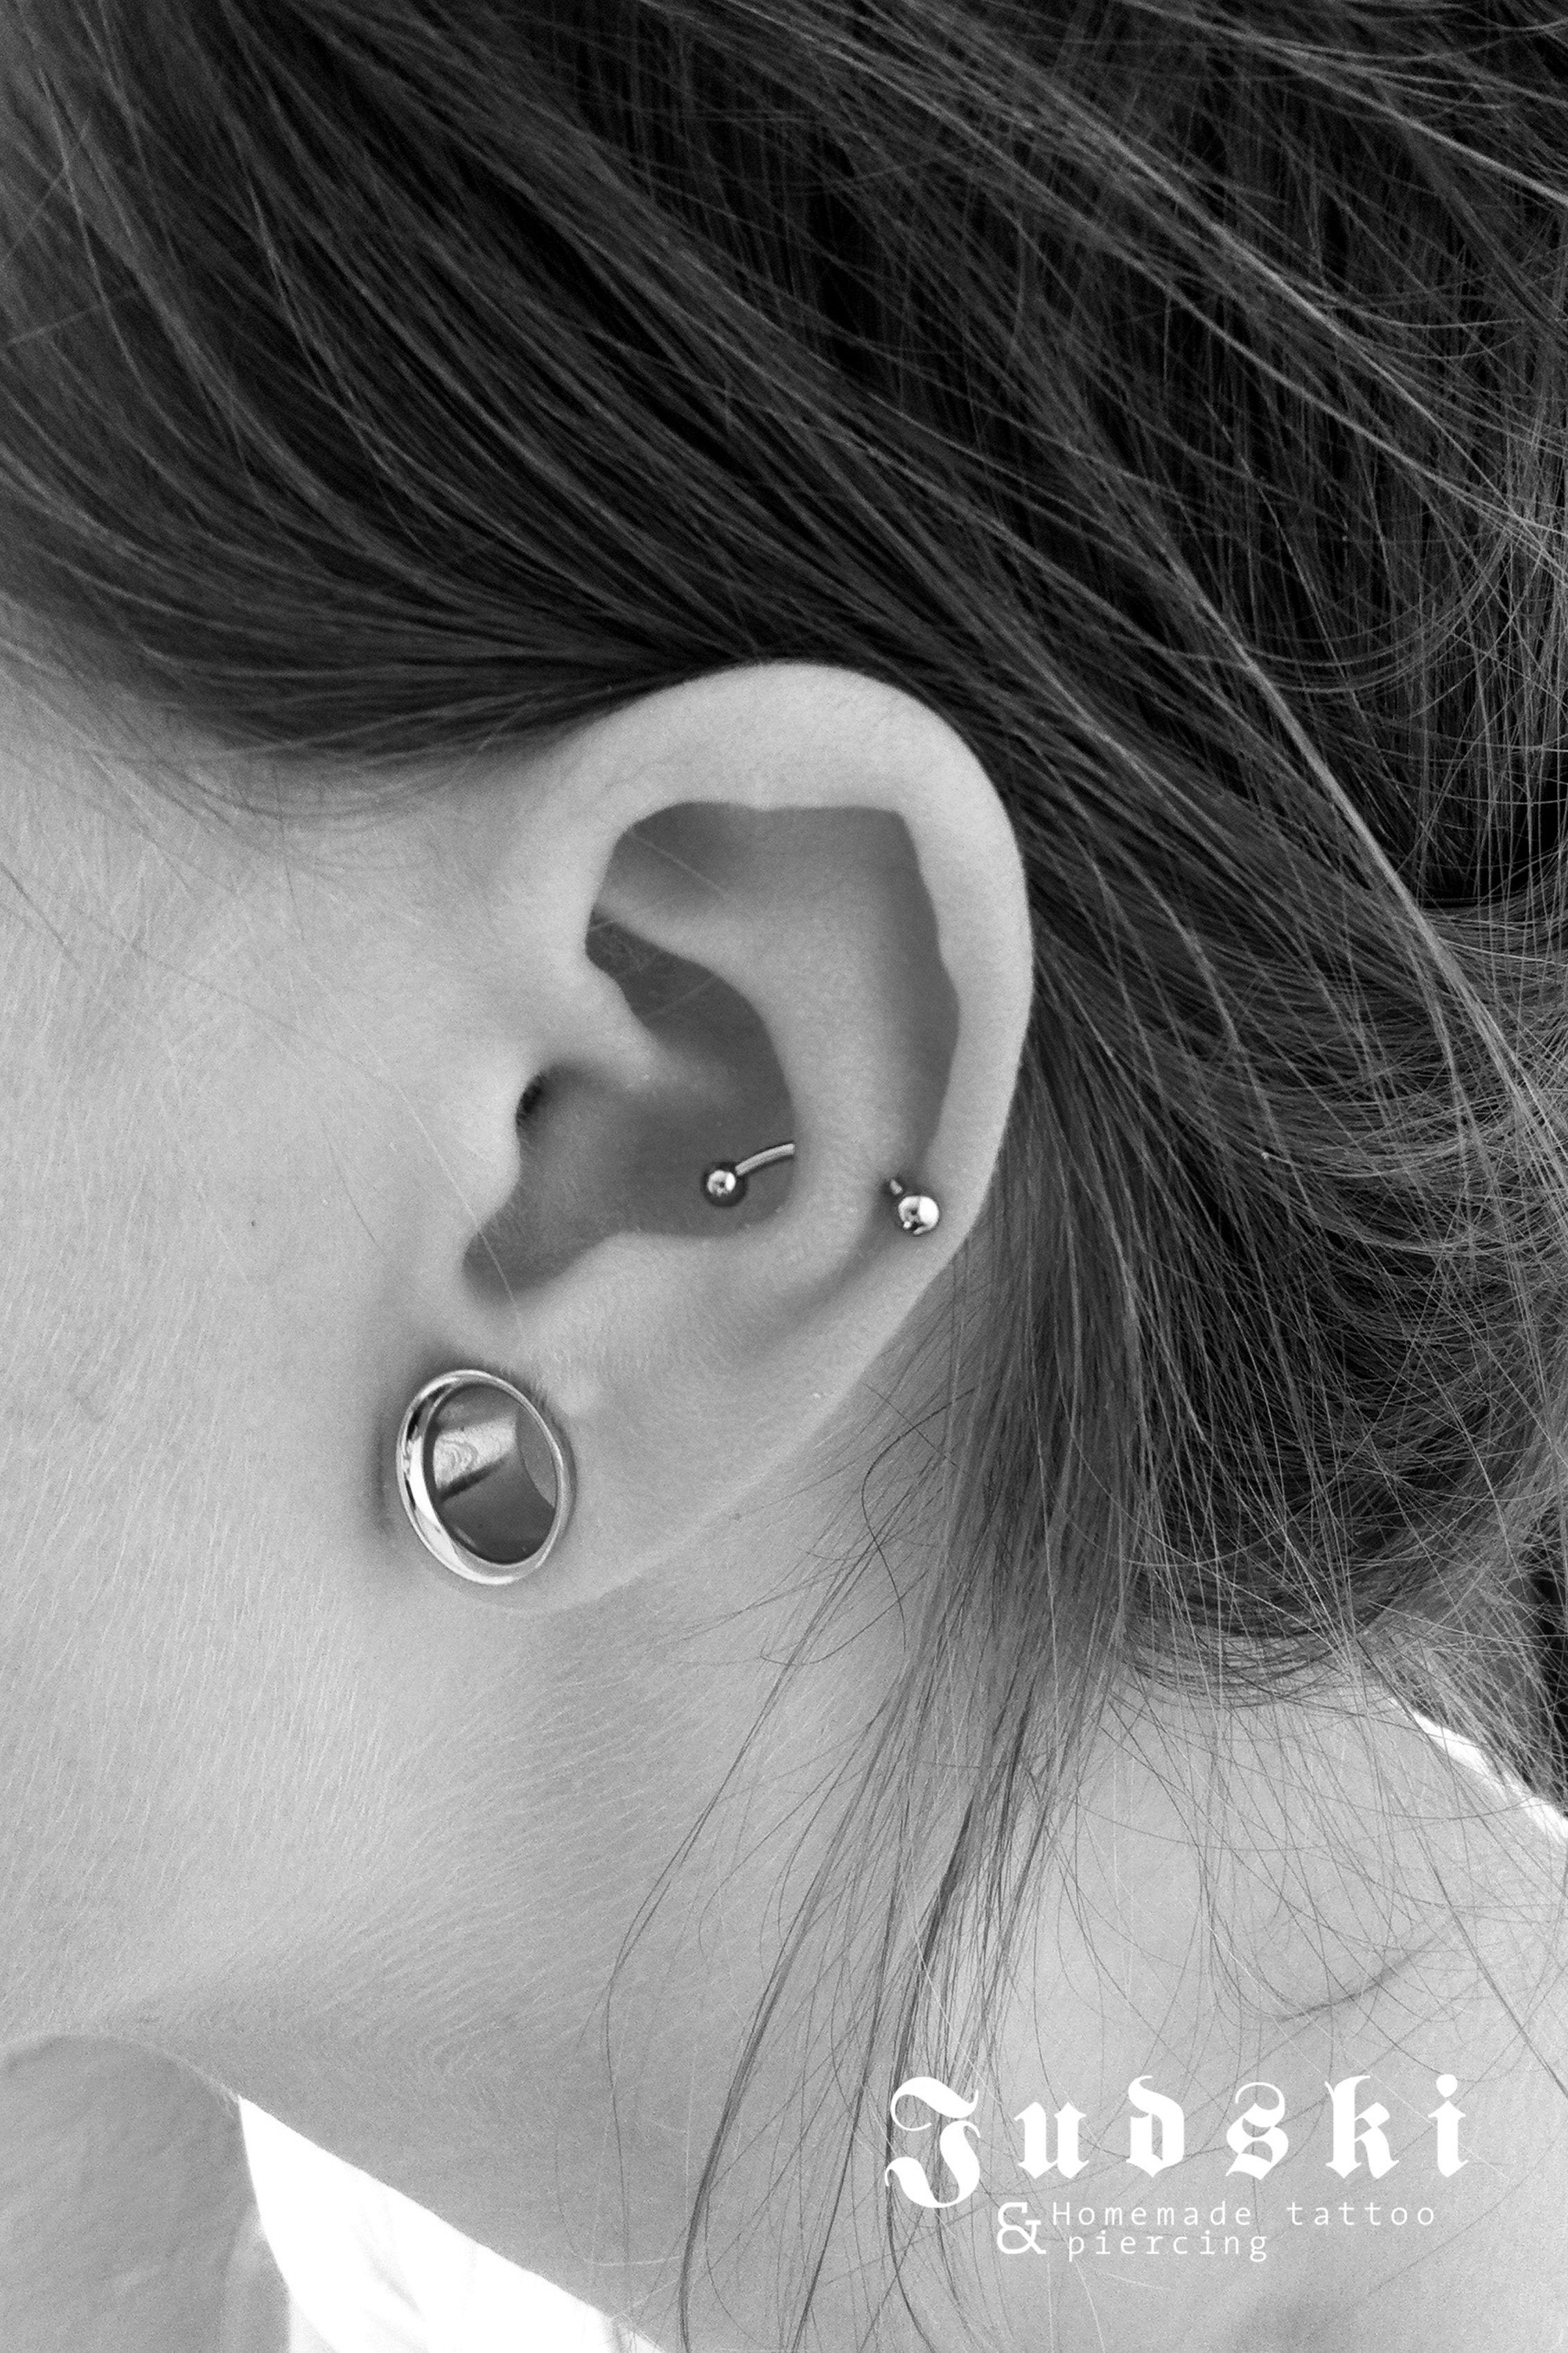 Cute nose piercing  Judski Homemade Tattoo u Piercing ue judski  Piercing